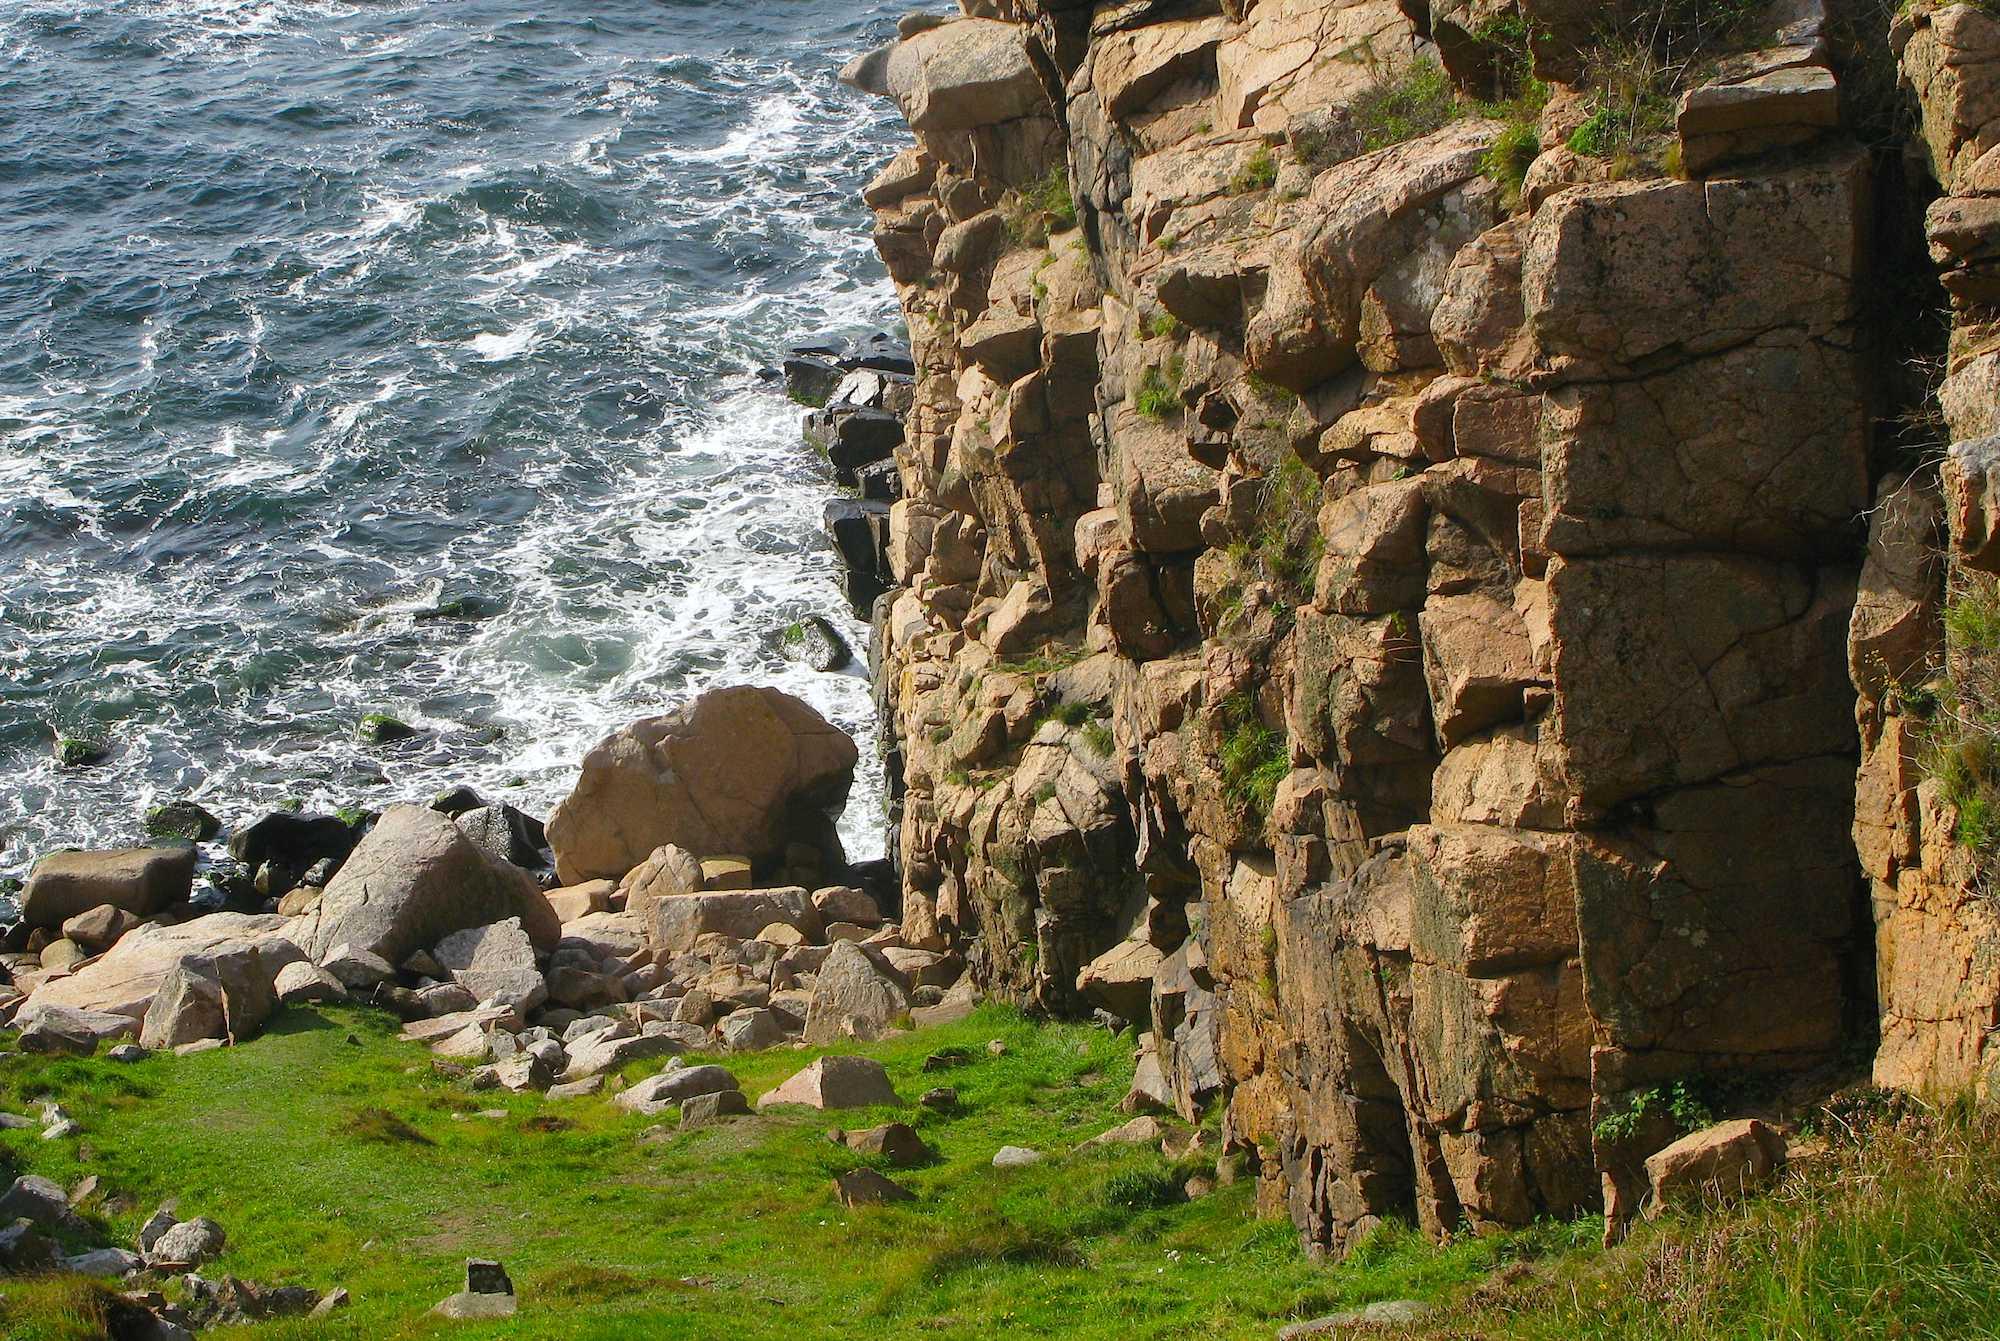 klipper i danmark